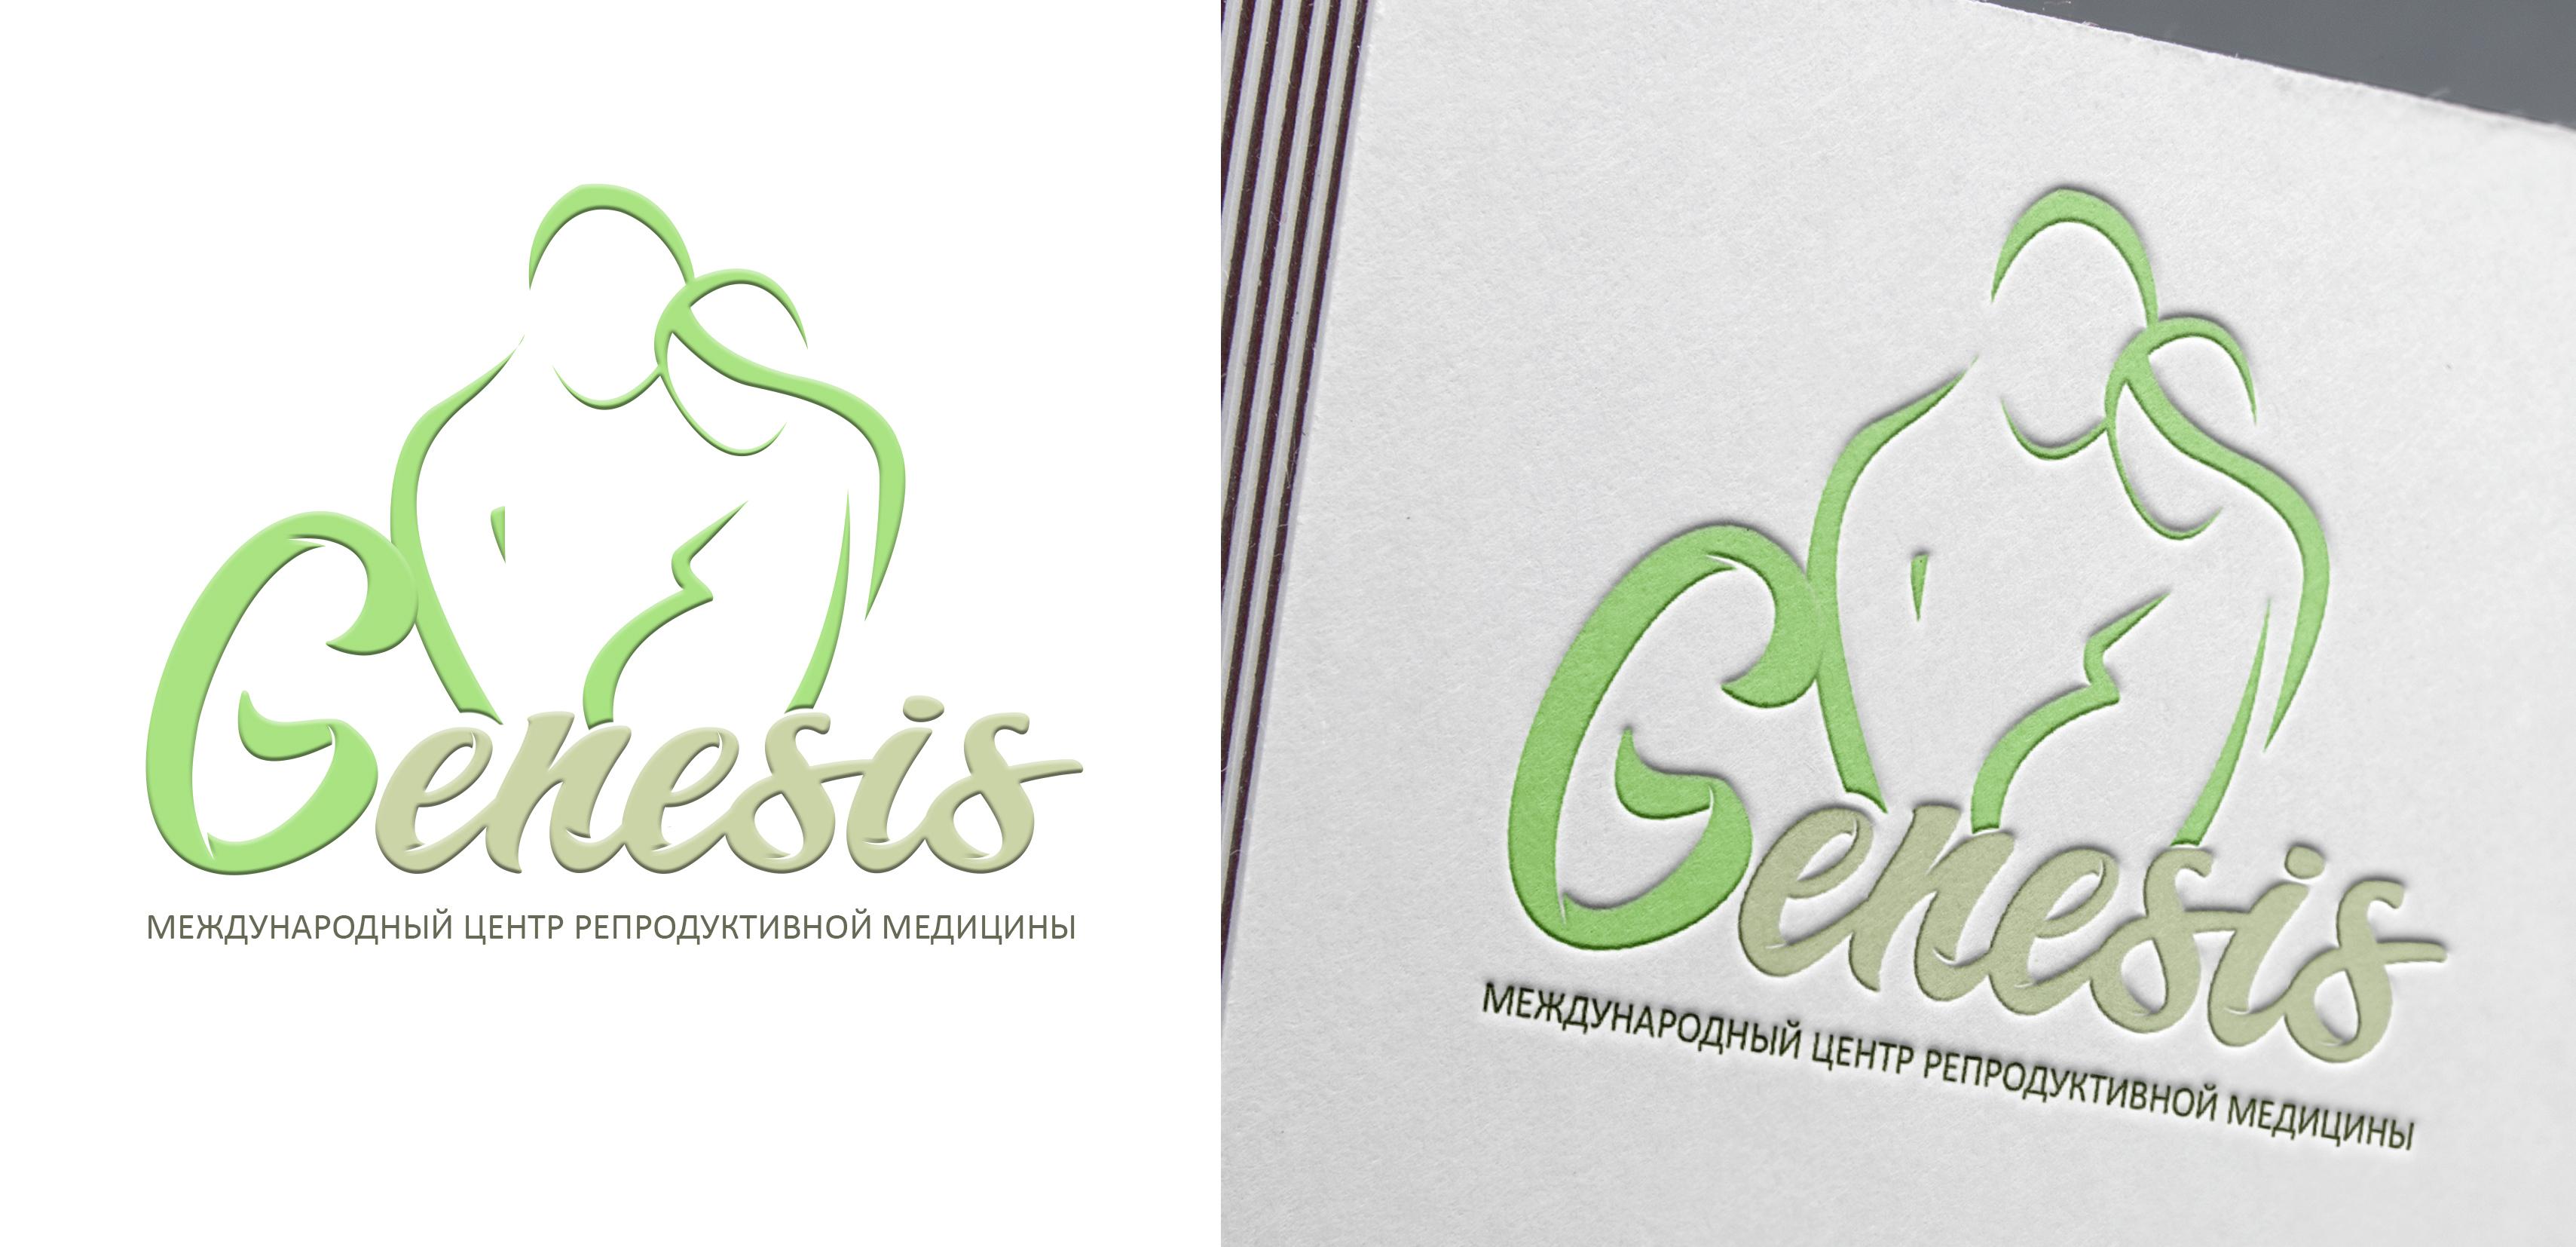 Нейминг+Логотип фото f_63858f8ec6eb8909.jpg